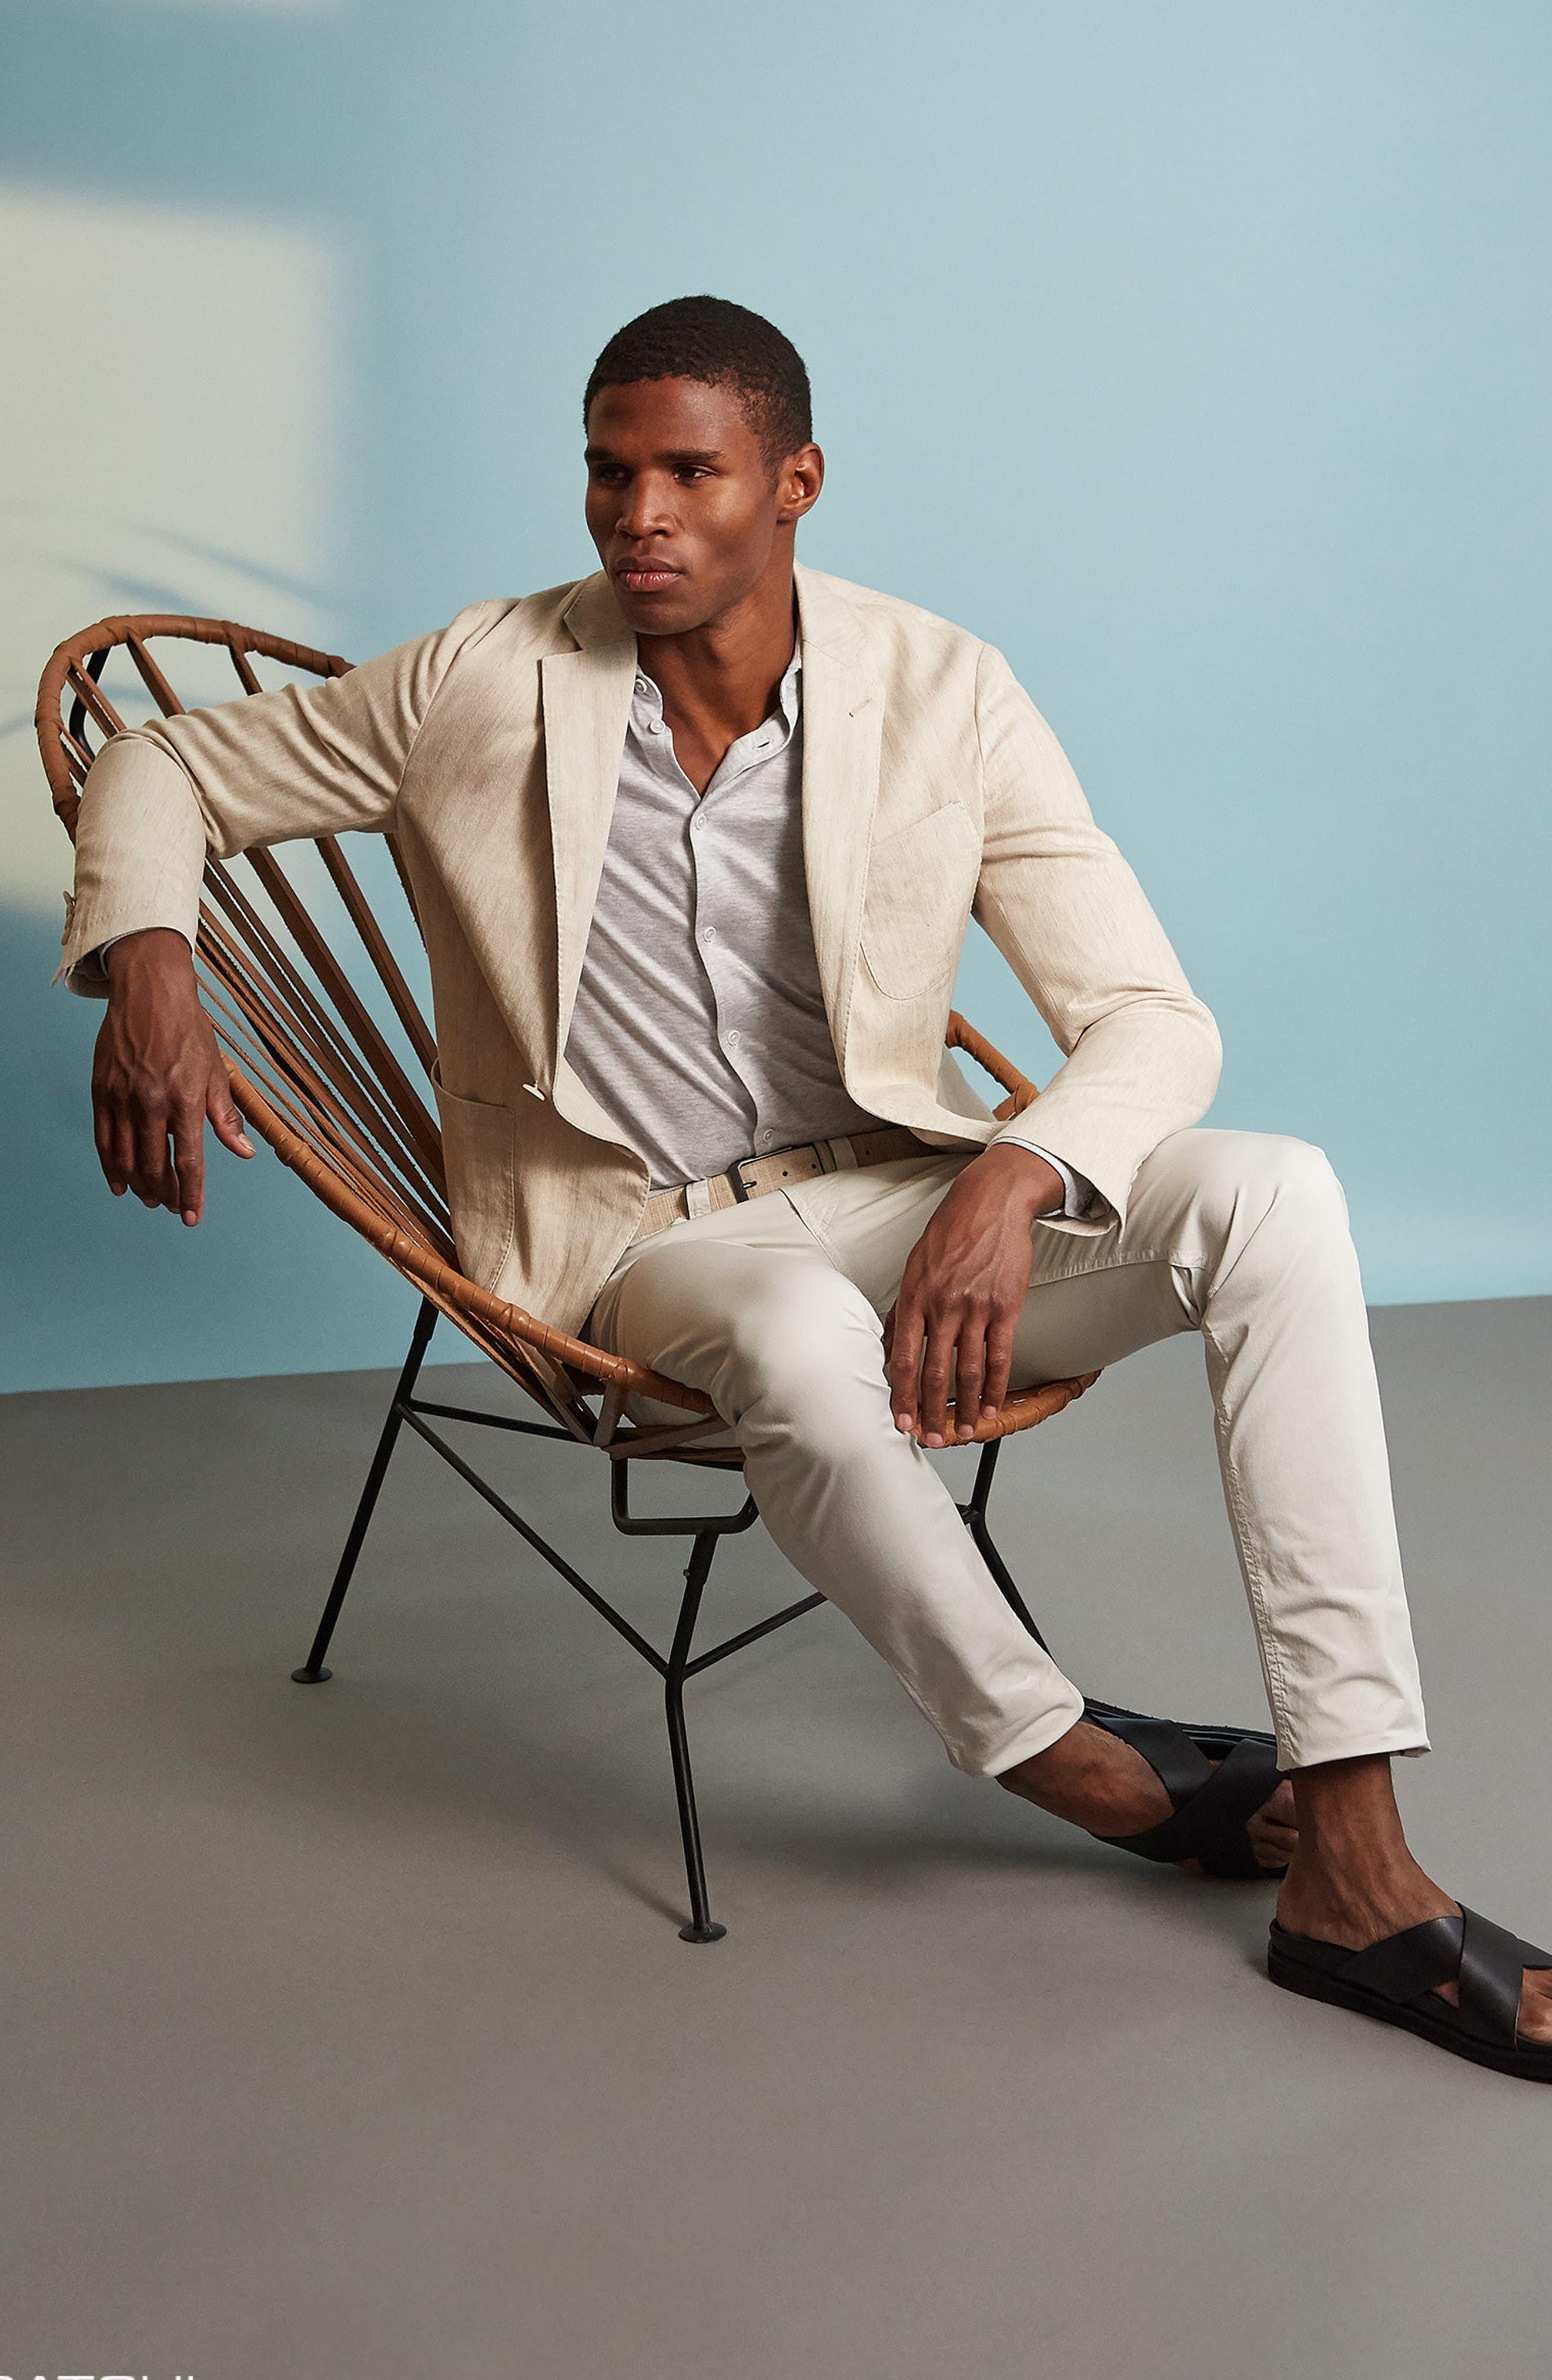 Regular Fit Herringbone Cotton & Linen Blazer,                             Alternate thumbnail 8, color,                             200